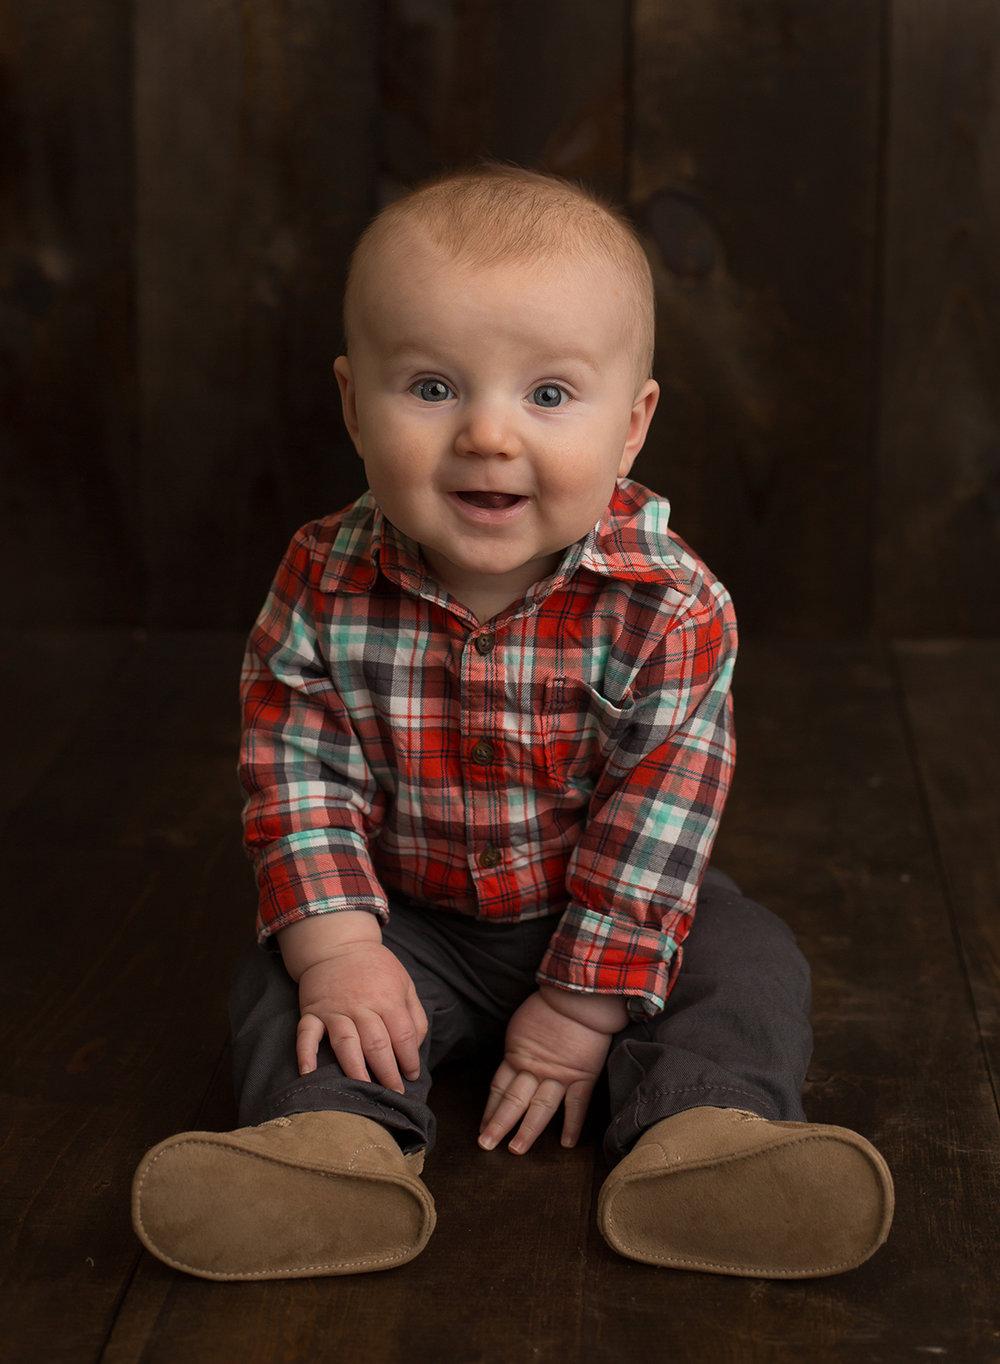 cute baby photos johnson county kansas